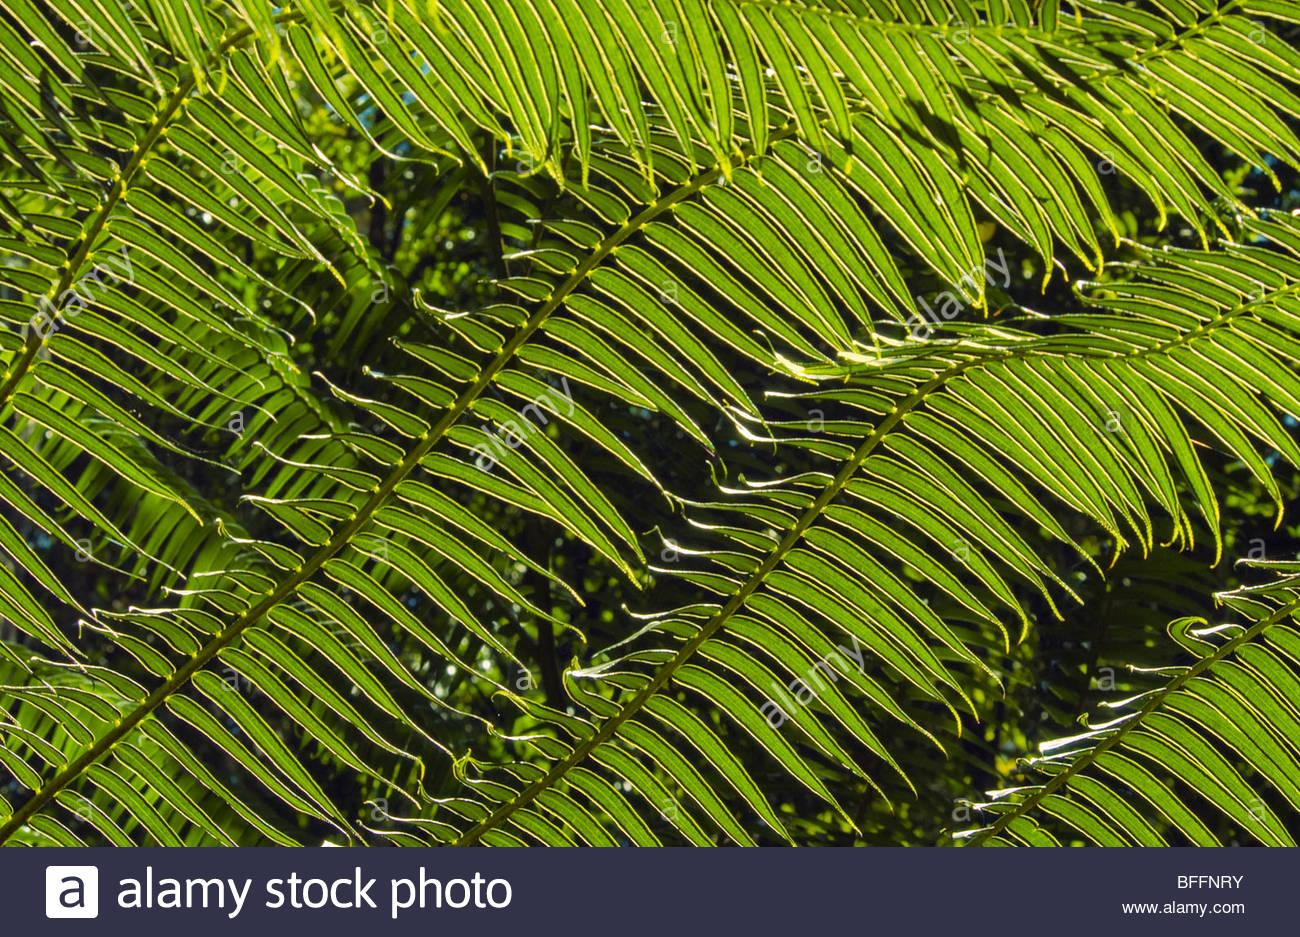 King ferns, Angiopteris evecta, Atherton Tableland, Queensland, Australia - Stock Image